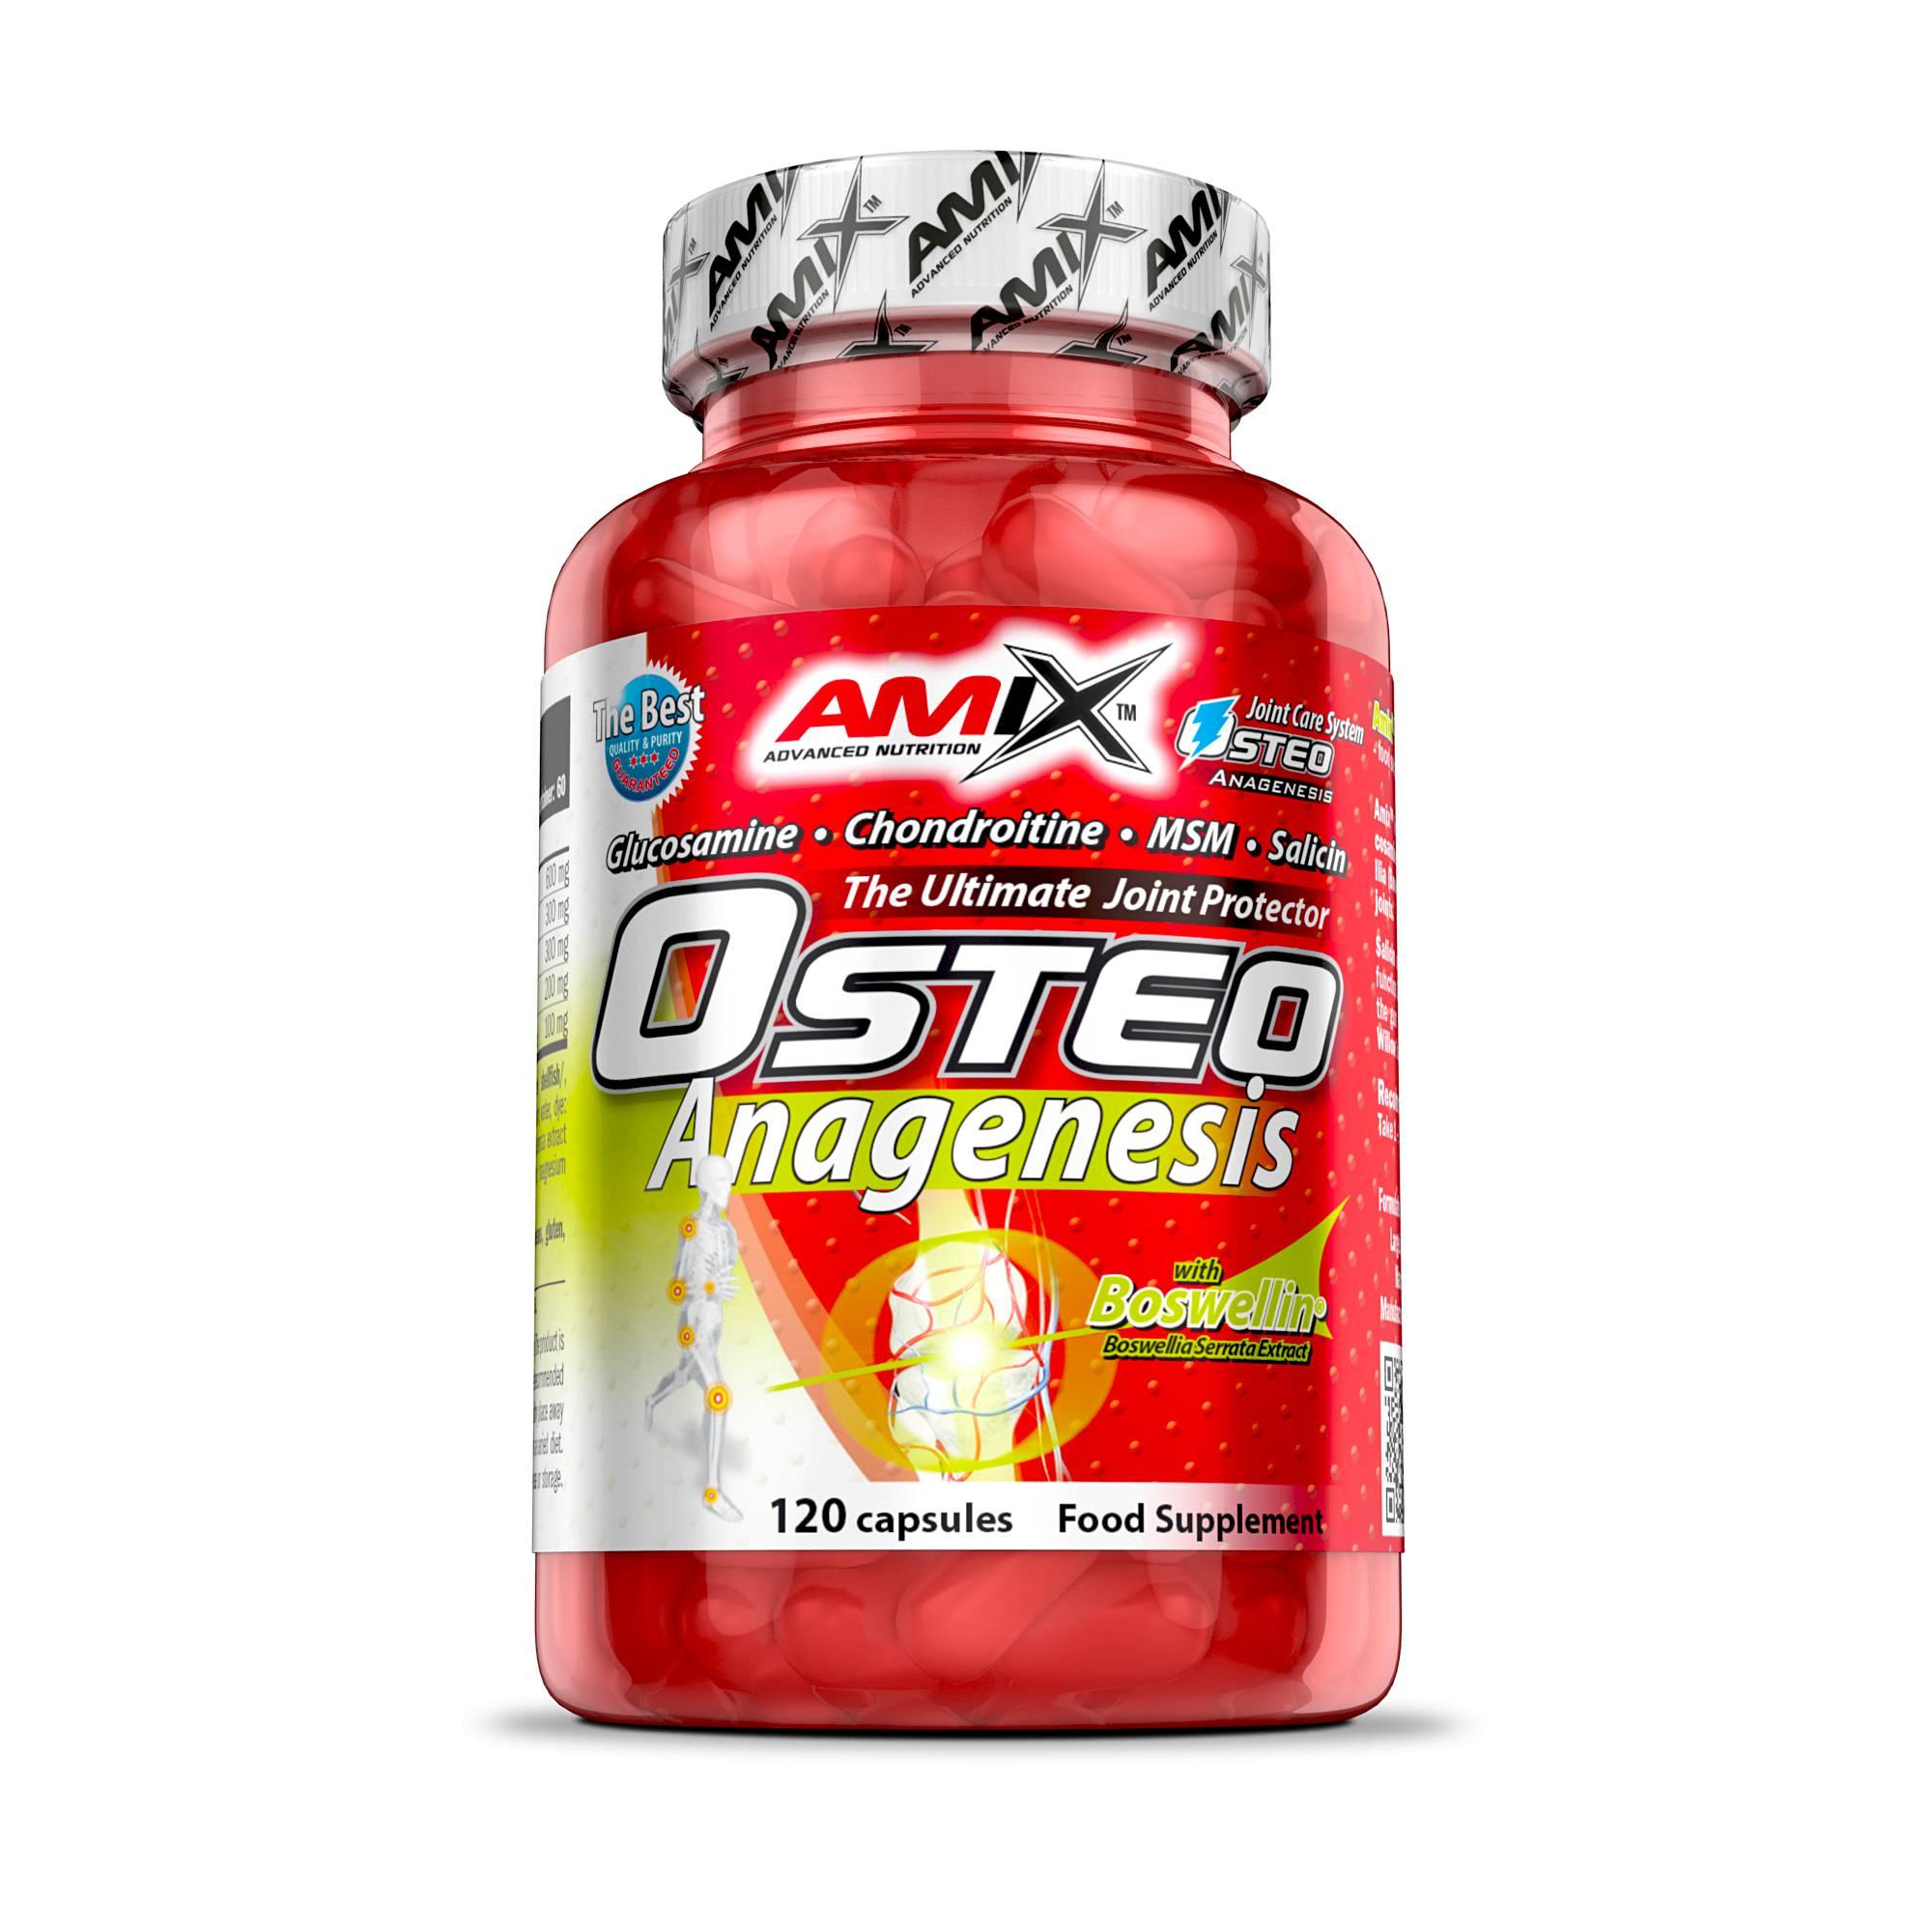 osteo anagenesis